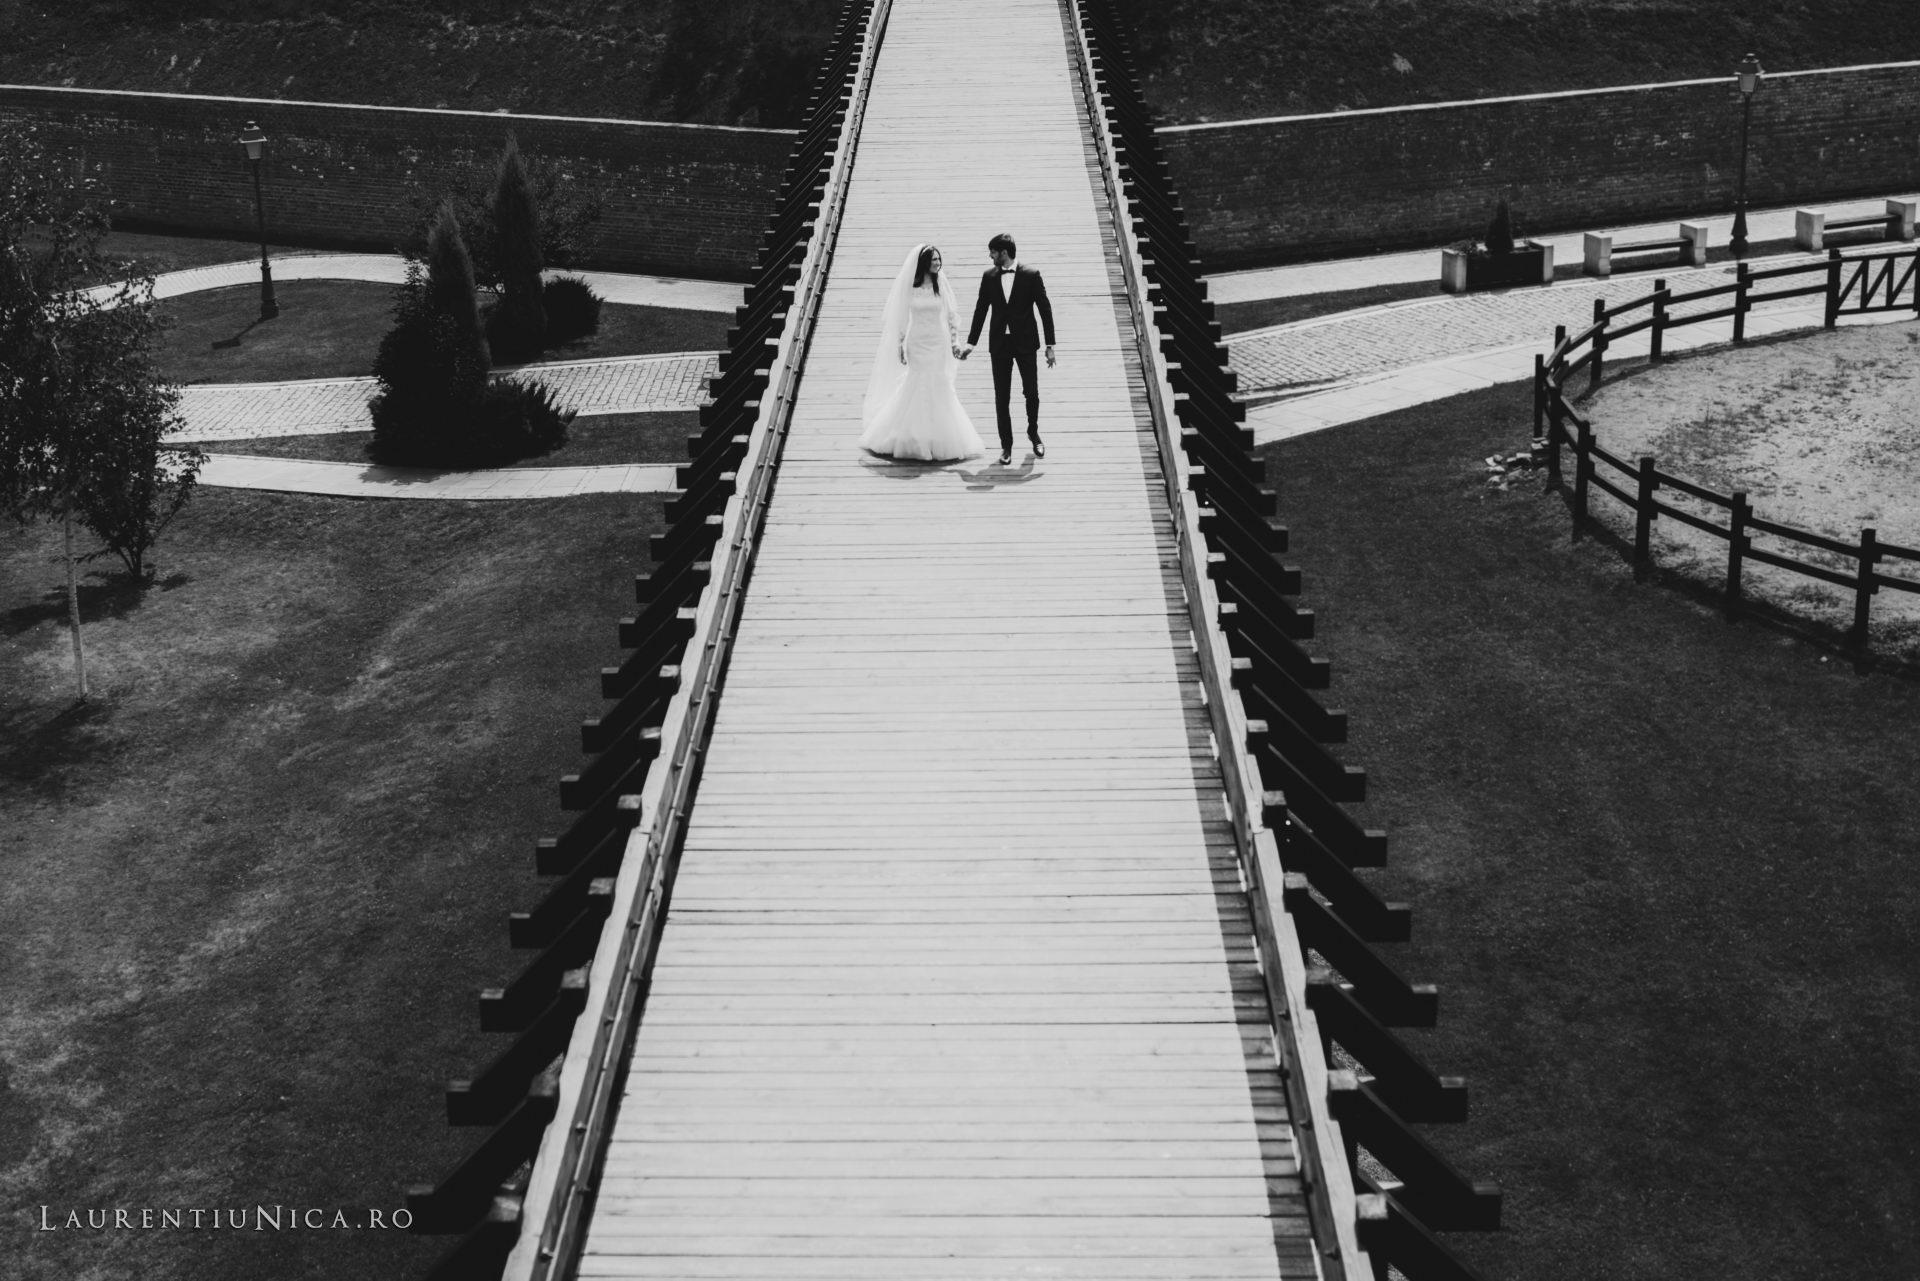 cristina_si_ovidiu-after-wedding-alba-iulia_fotograf_laurentiu_nica_18